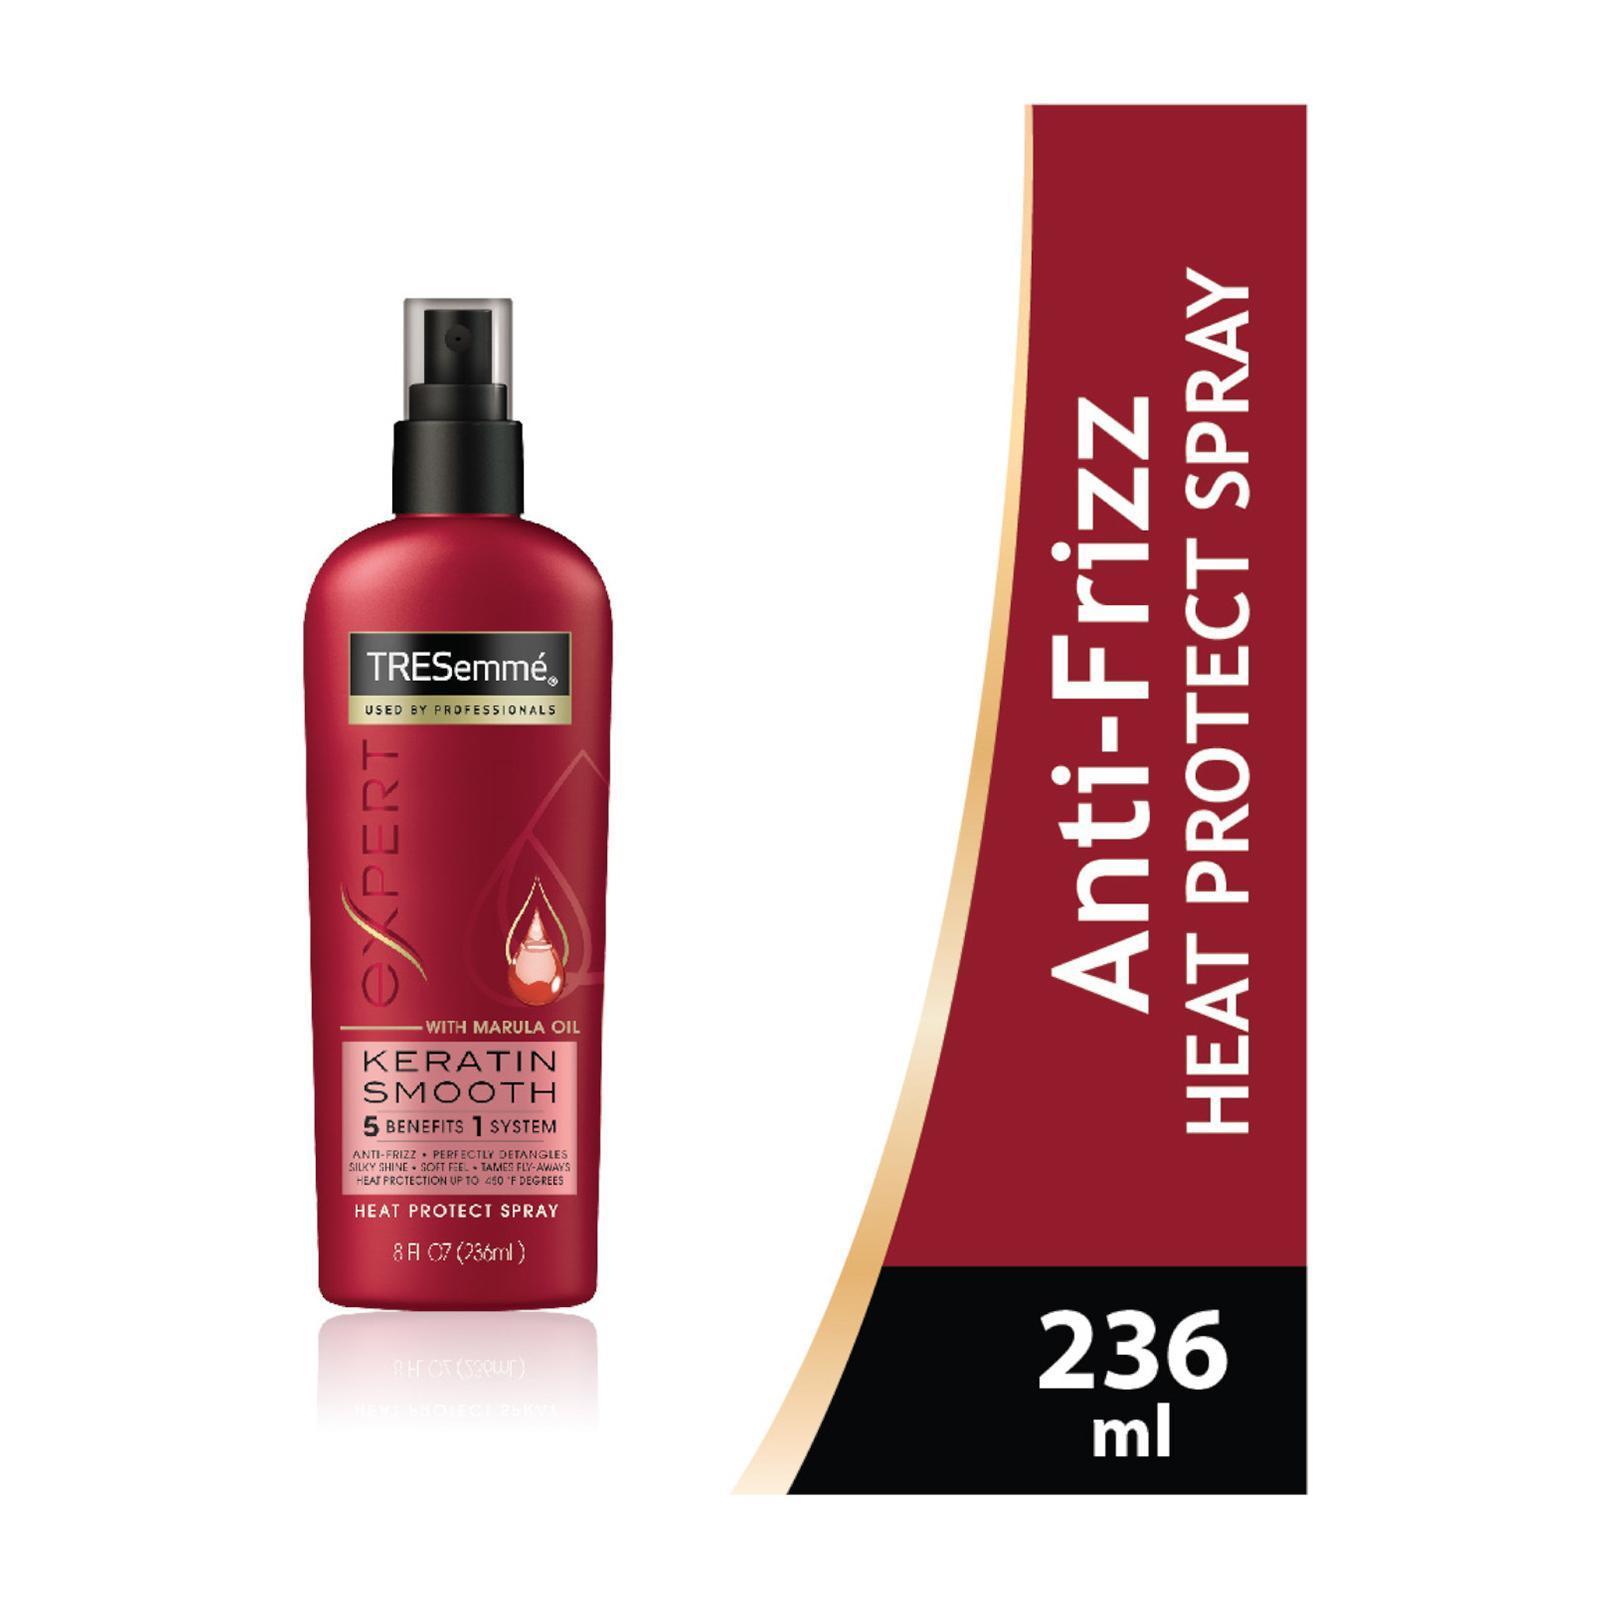 TRESemme Keratin Smooth Heat Protect Hair Spray, 236ml